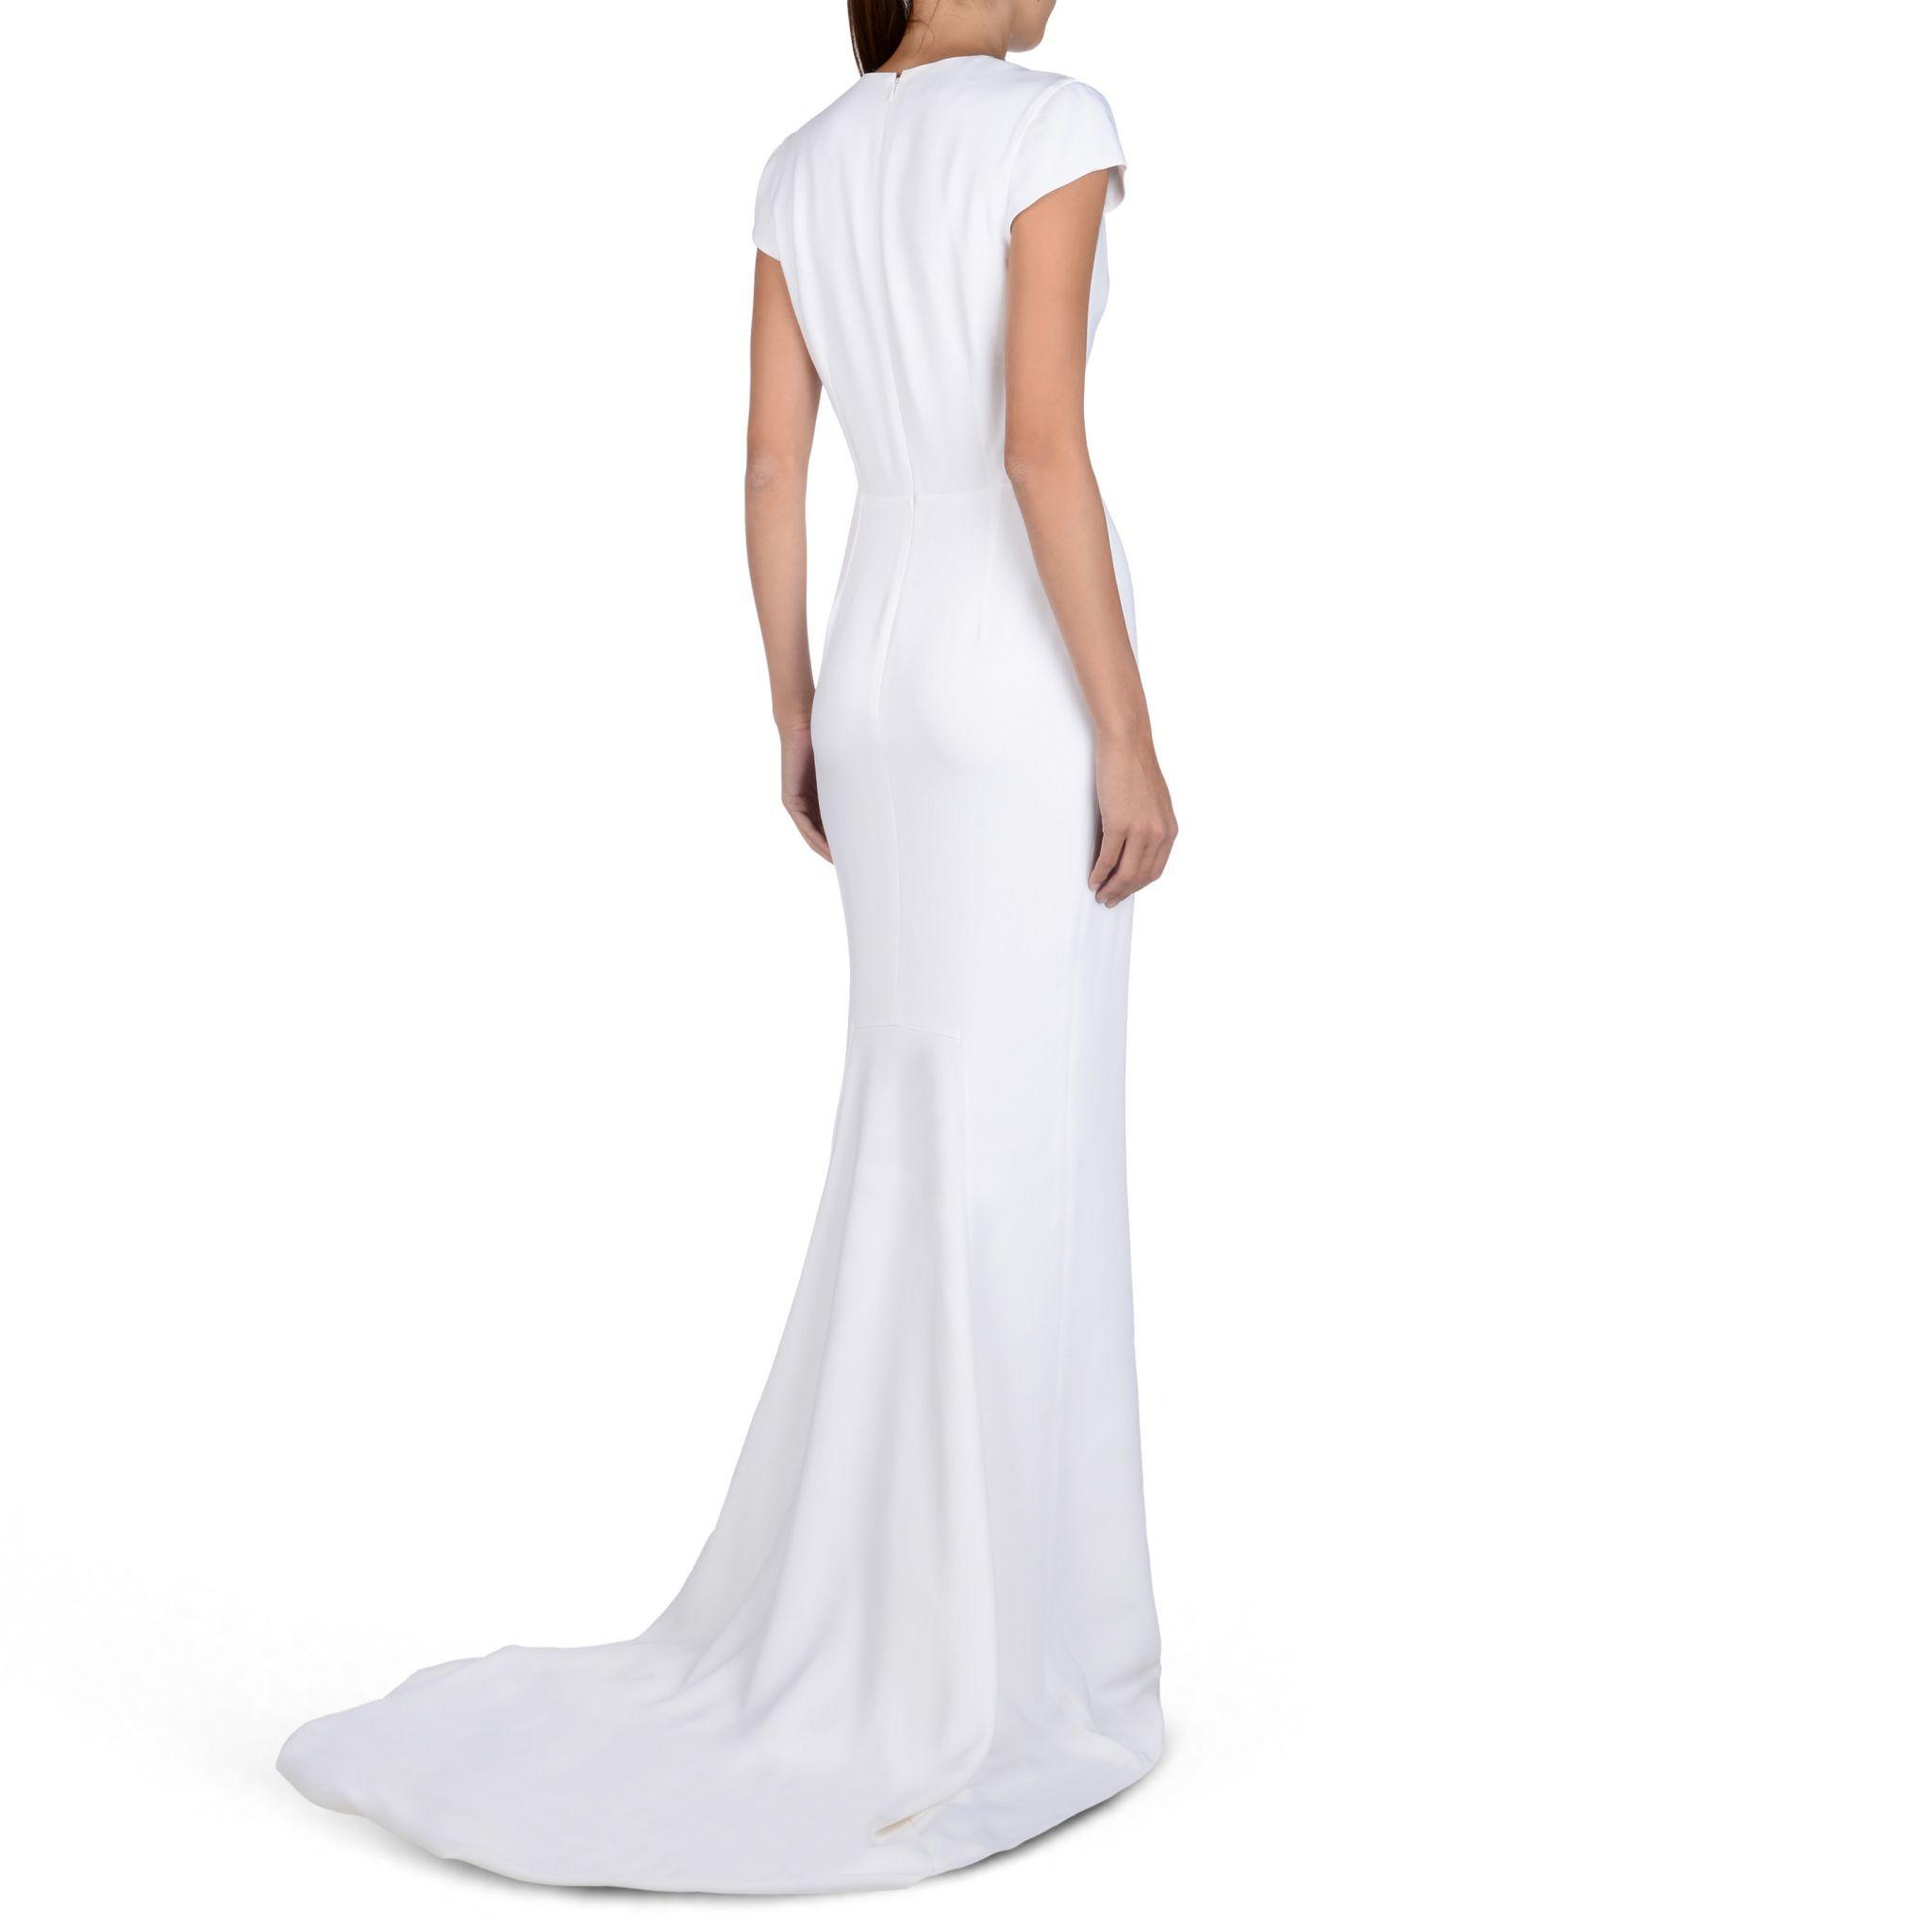 Other Stella Mccartney White Avril Dress Wedding Dress New Size 4 600 Dresses Wedding Dresses Modern Dress [ 2048 x 2048 Pixel ]